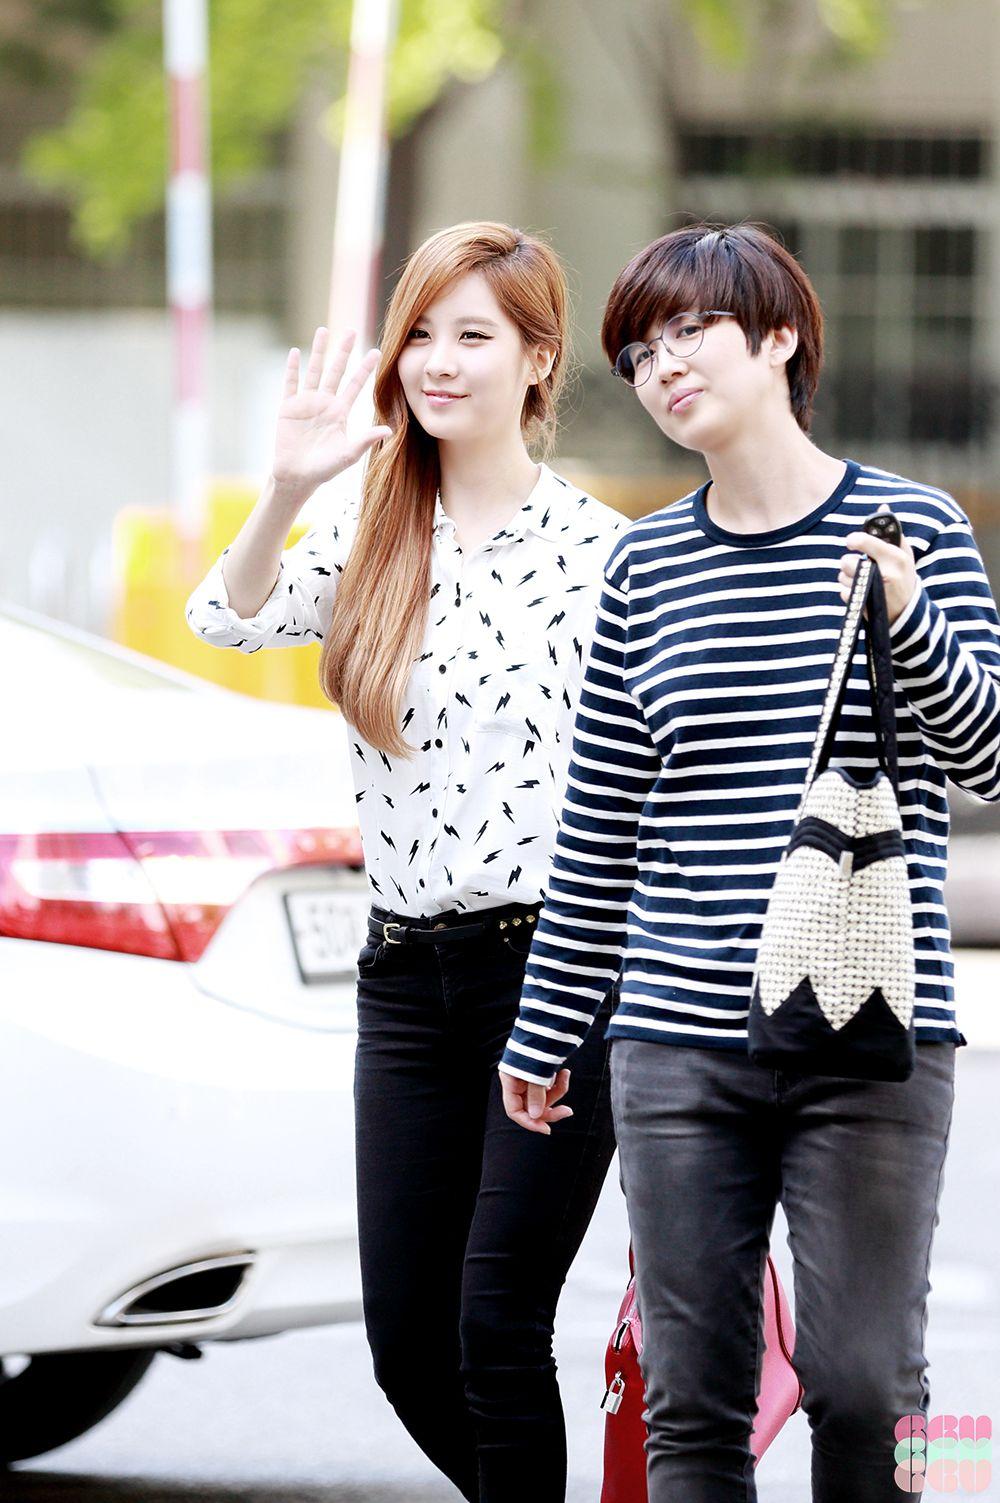 Maknae couple love story seohyun dating